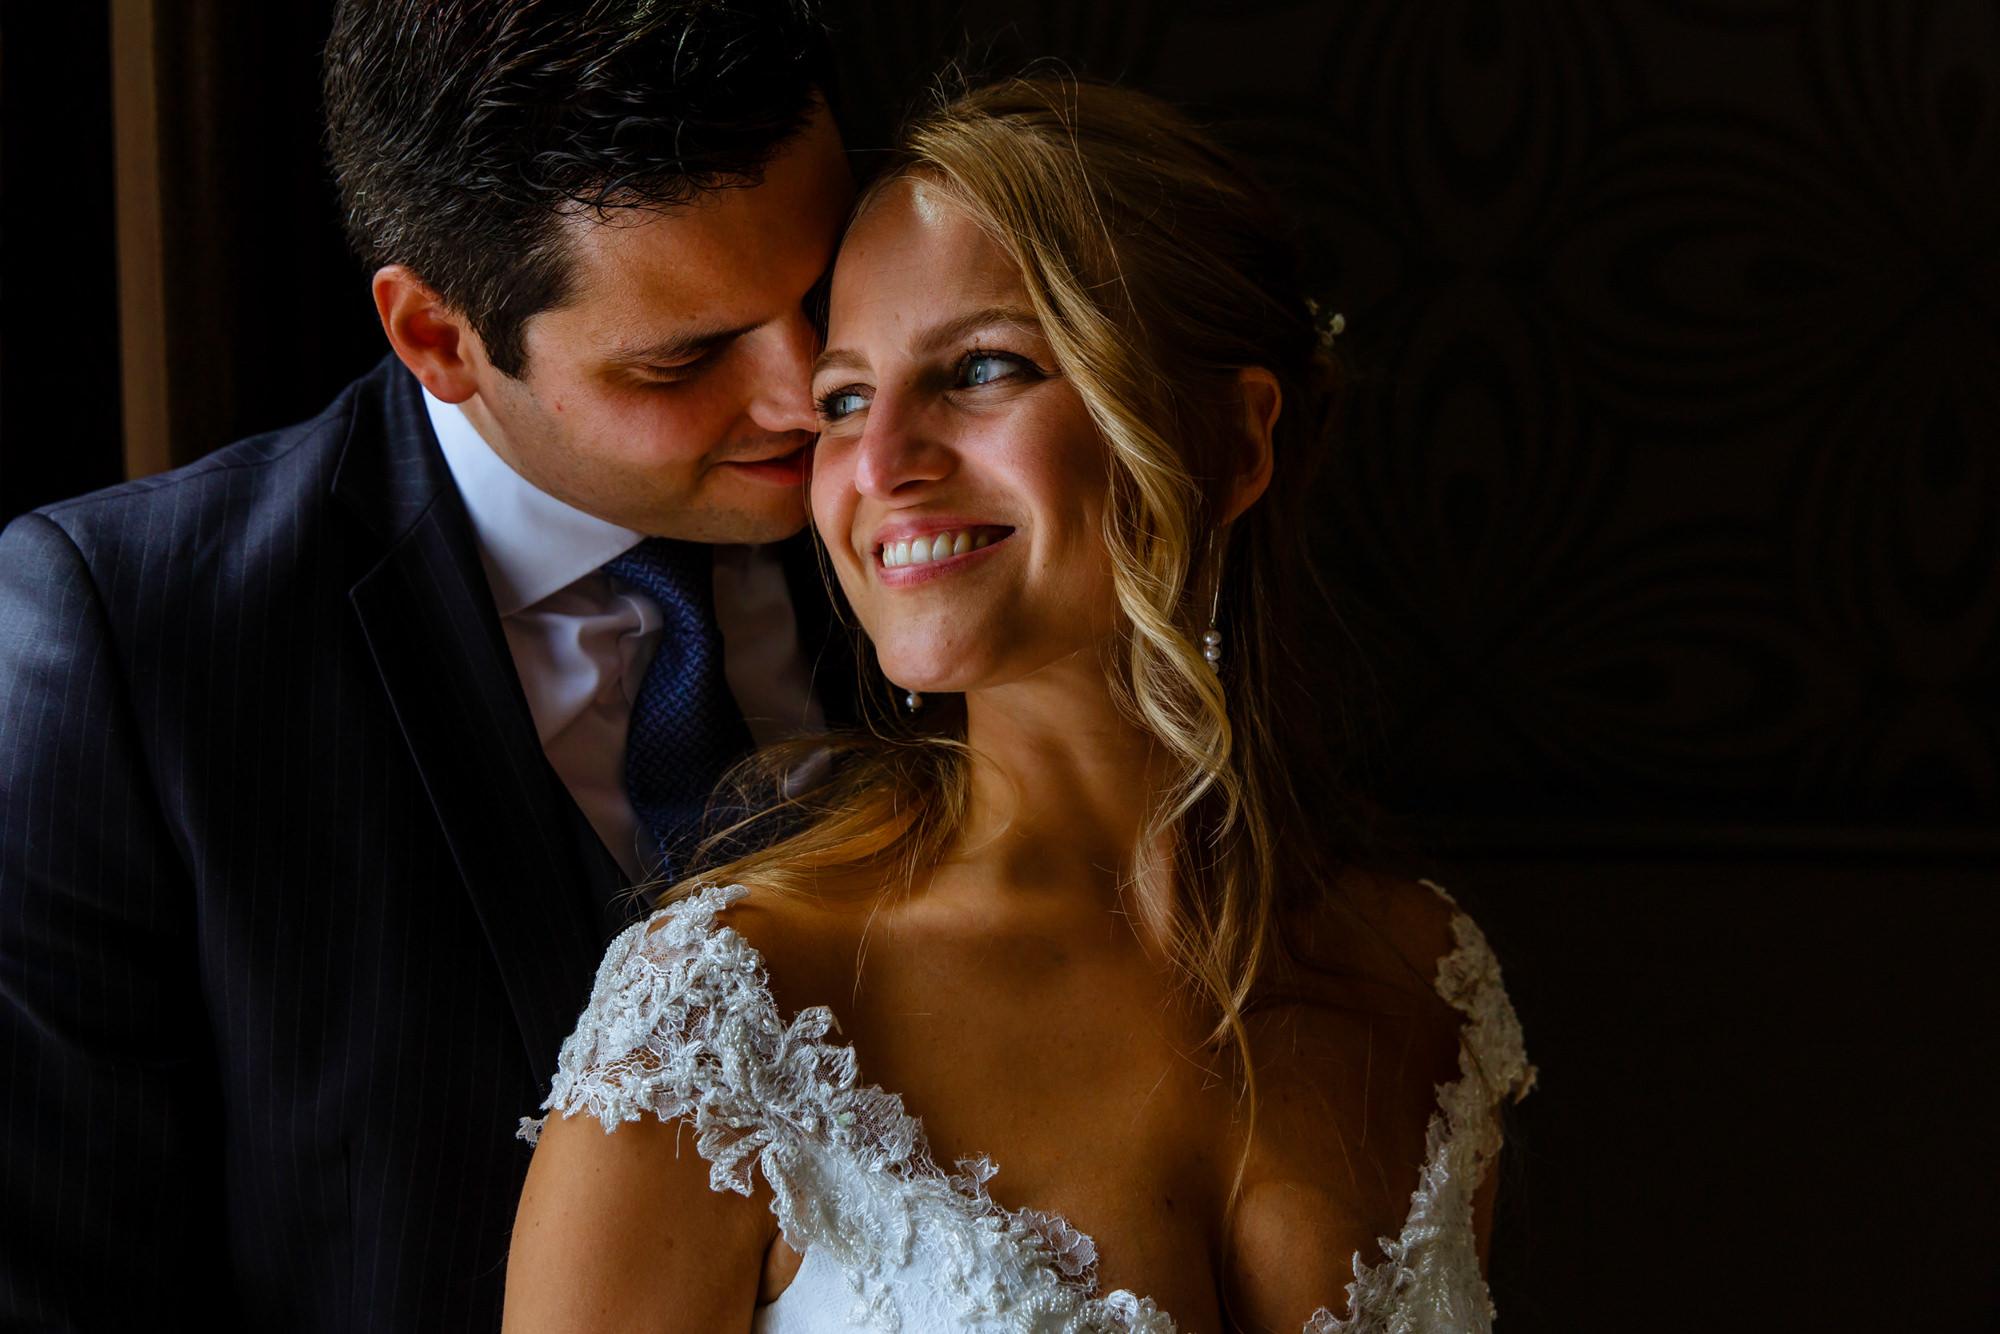 Portrait of bride and groom in windowlight by Phillipe Swiggers